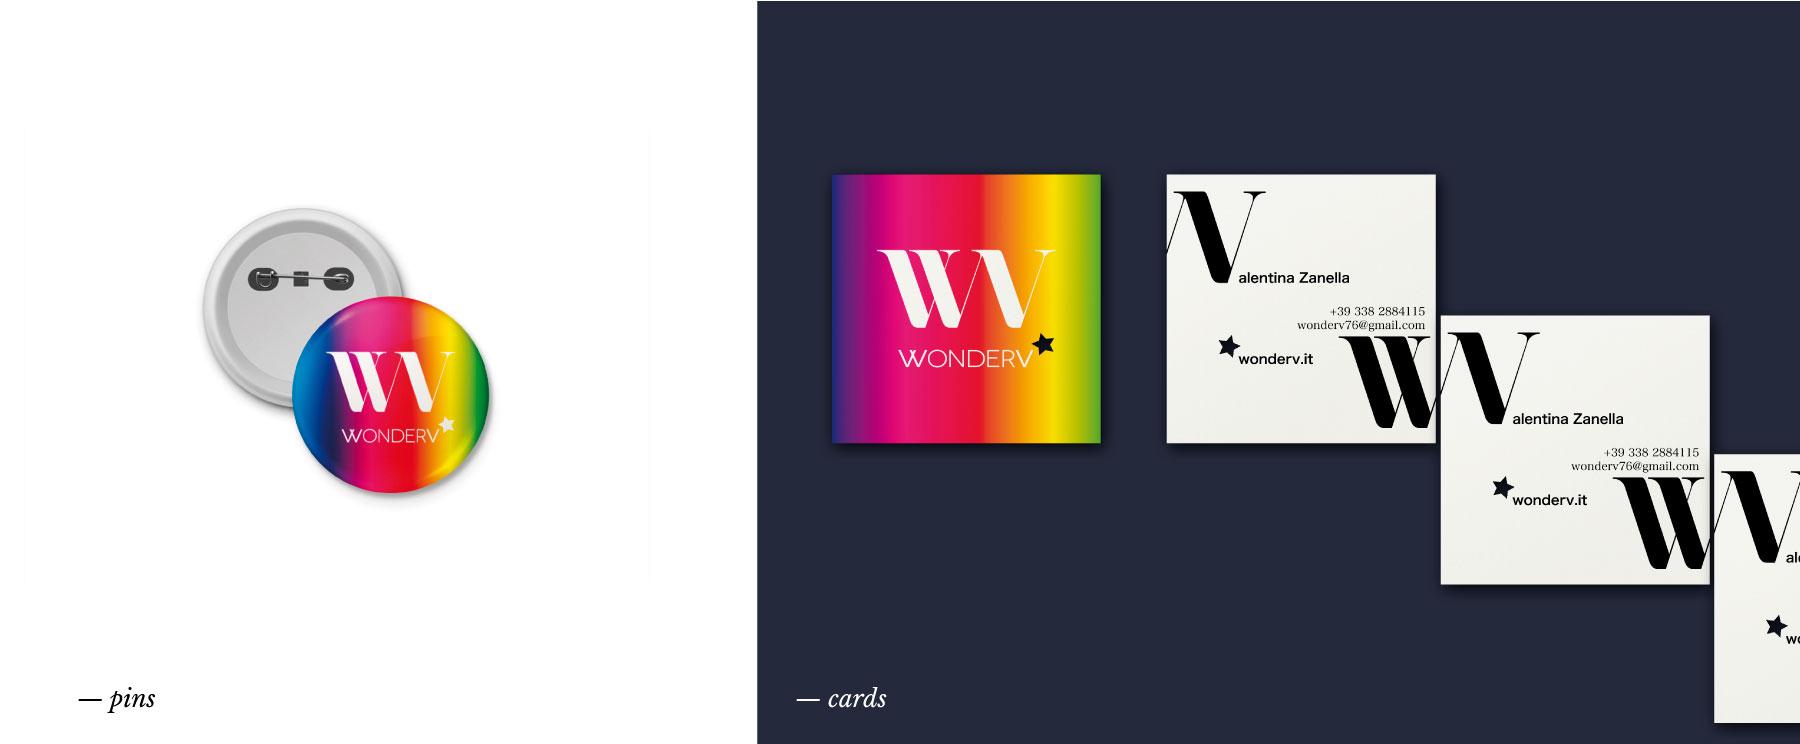 02-WonderV-pins-cards